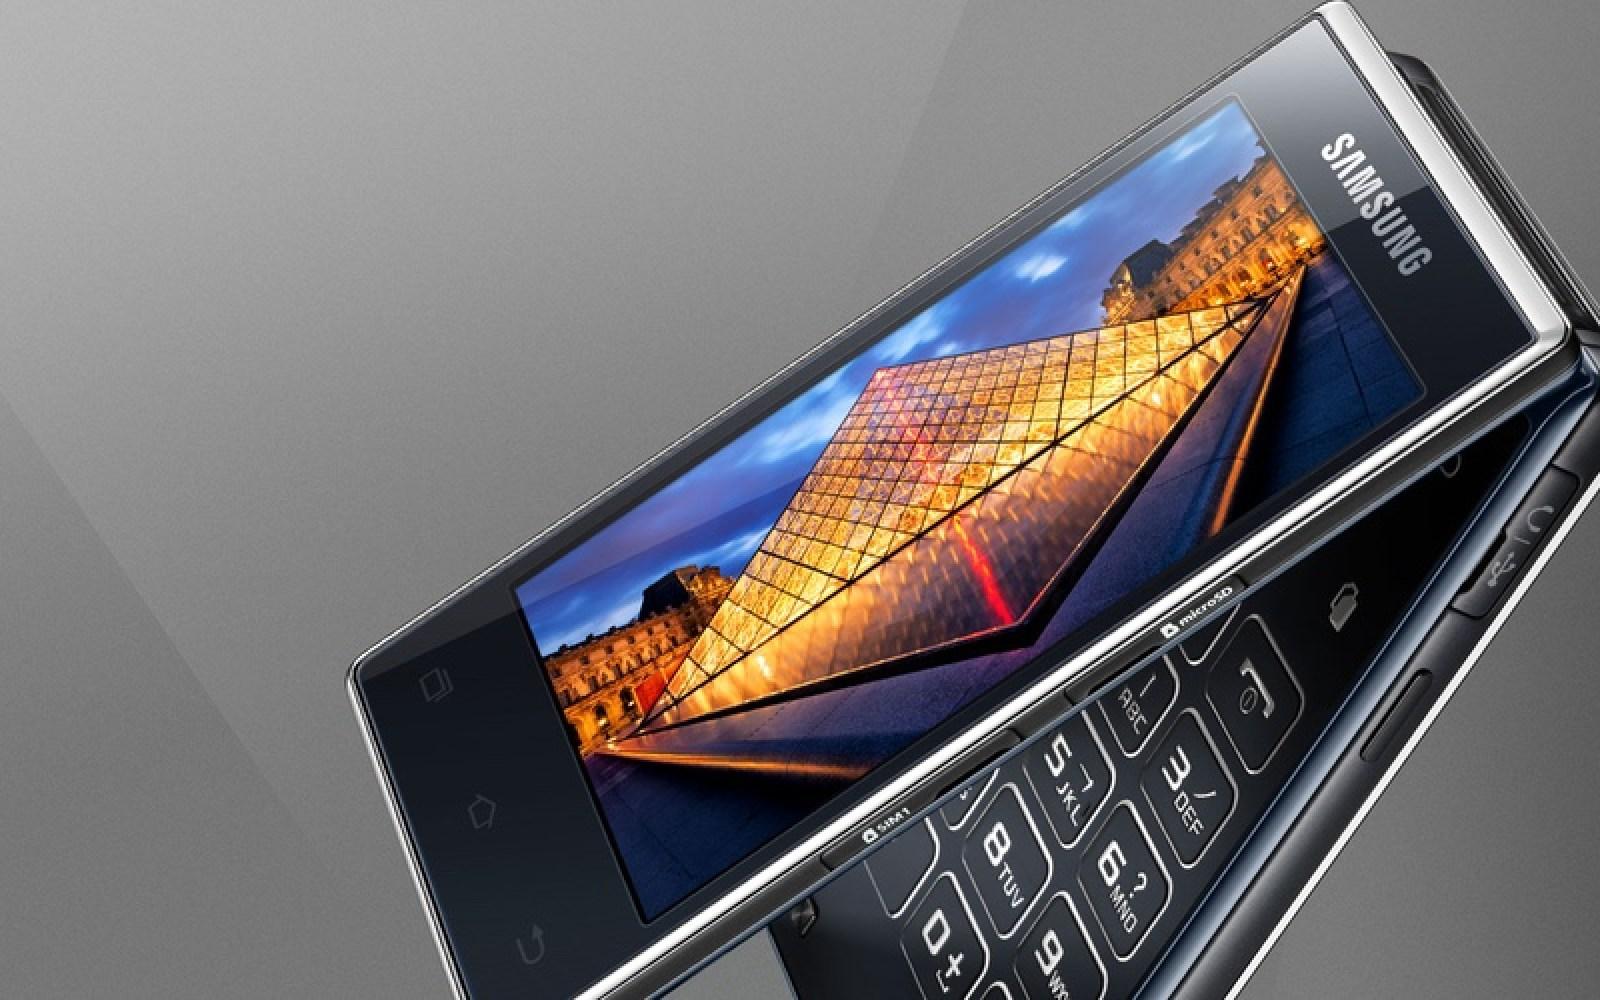 Samsung G9198 announced: New Snapdragon 808-powered, dual screen flip phone